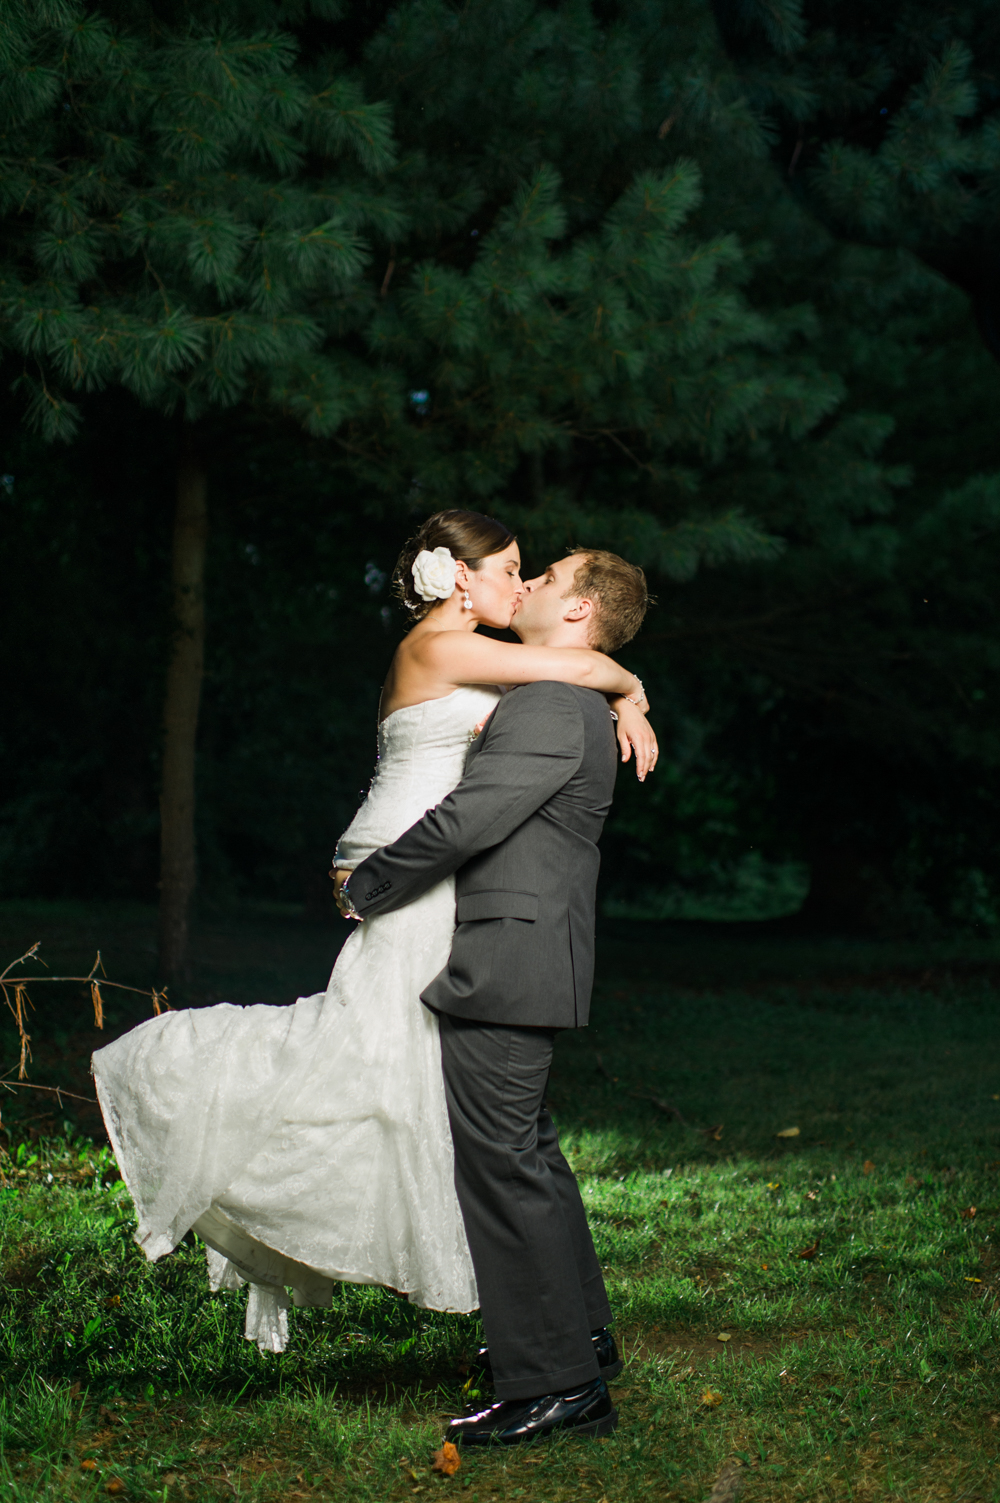 Mendenhall_Inn_Wedding_Pennsylvania_Rebecca_Watkins_Photography_2014-075.jpg